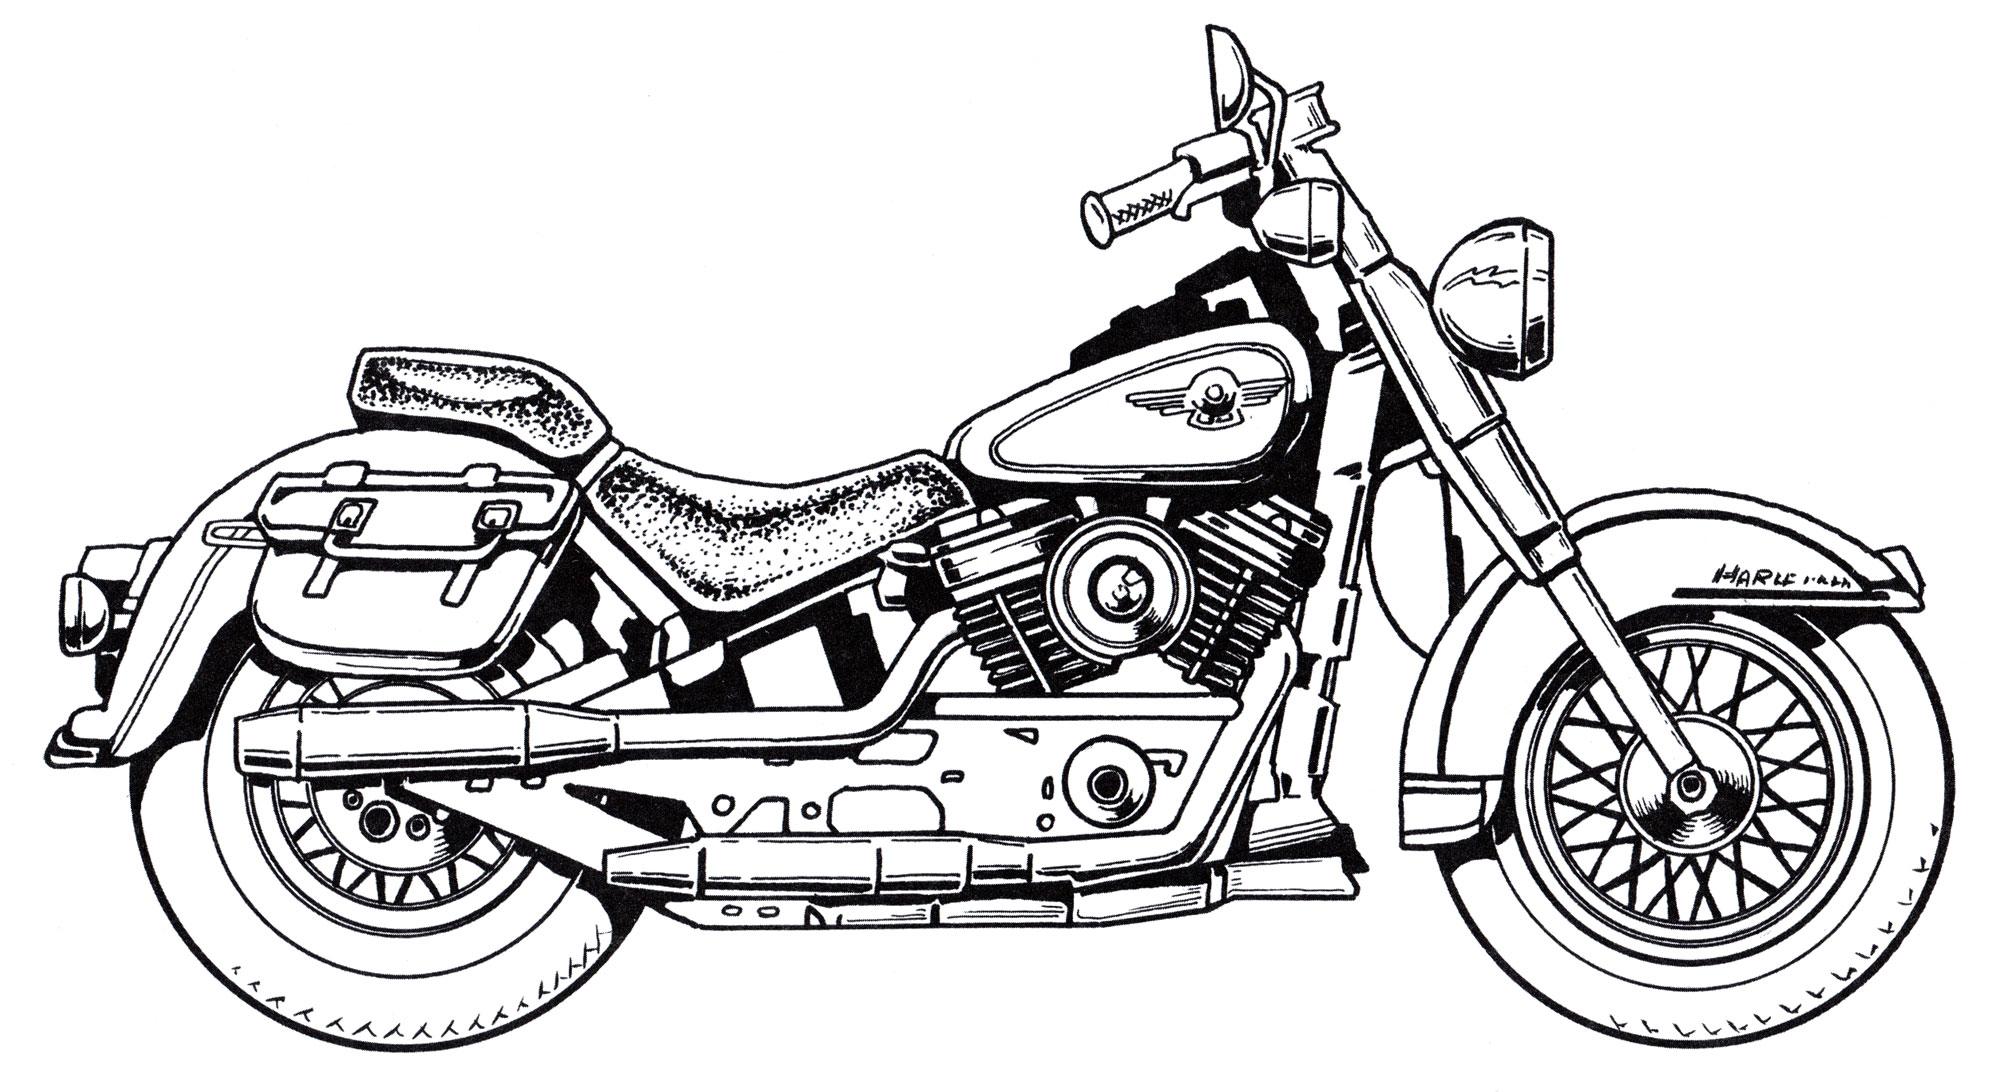 Раскраска Байкерский Харлей-Дэвидсон | Раскраски мотоциклы